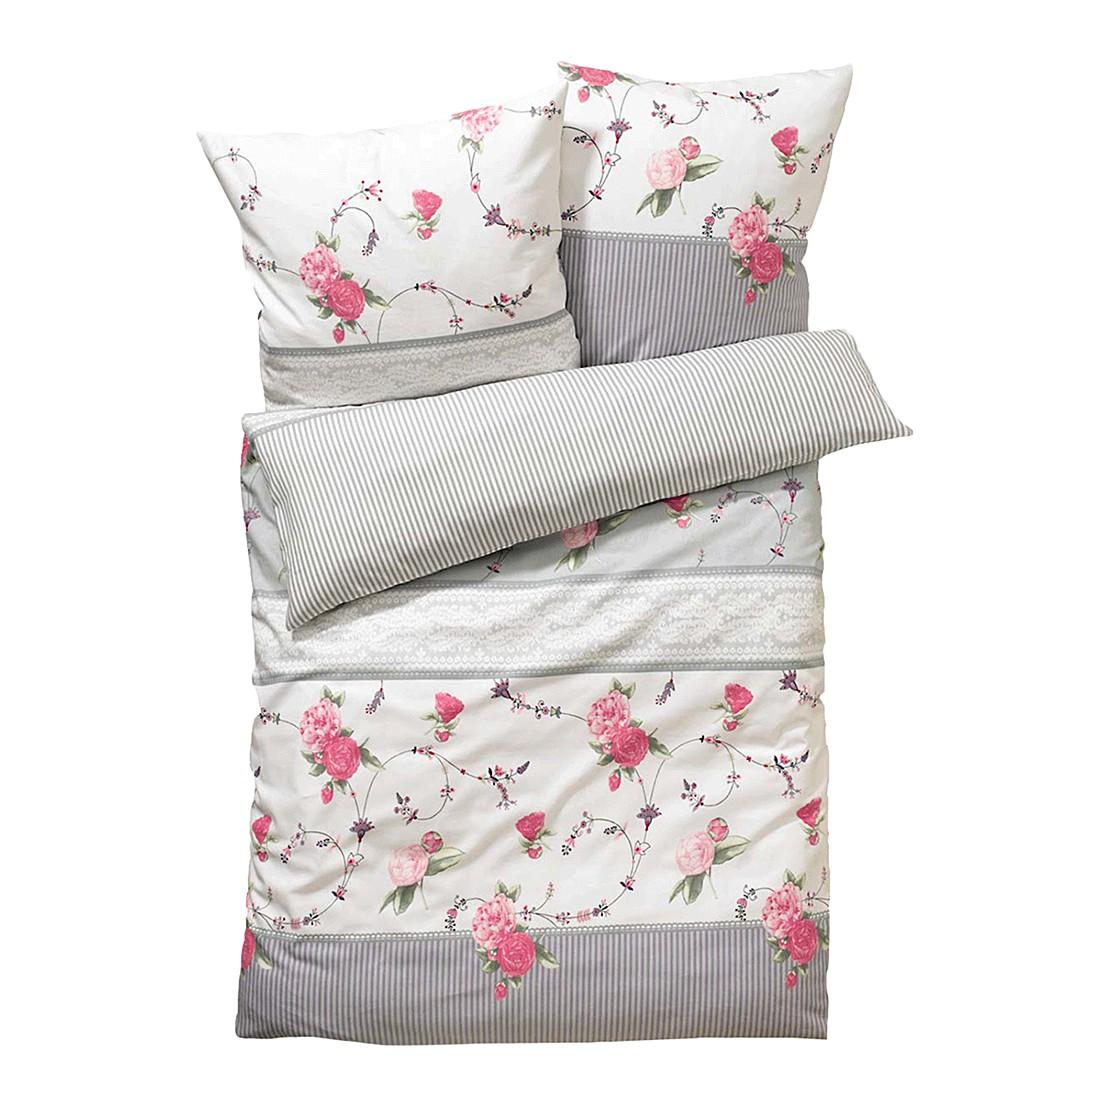 bettw sche amelie baumwolle bunt 155x220 pureday online bestellen. Black Bedroom Furniture Sets. Home Design Ideas